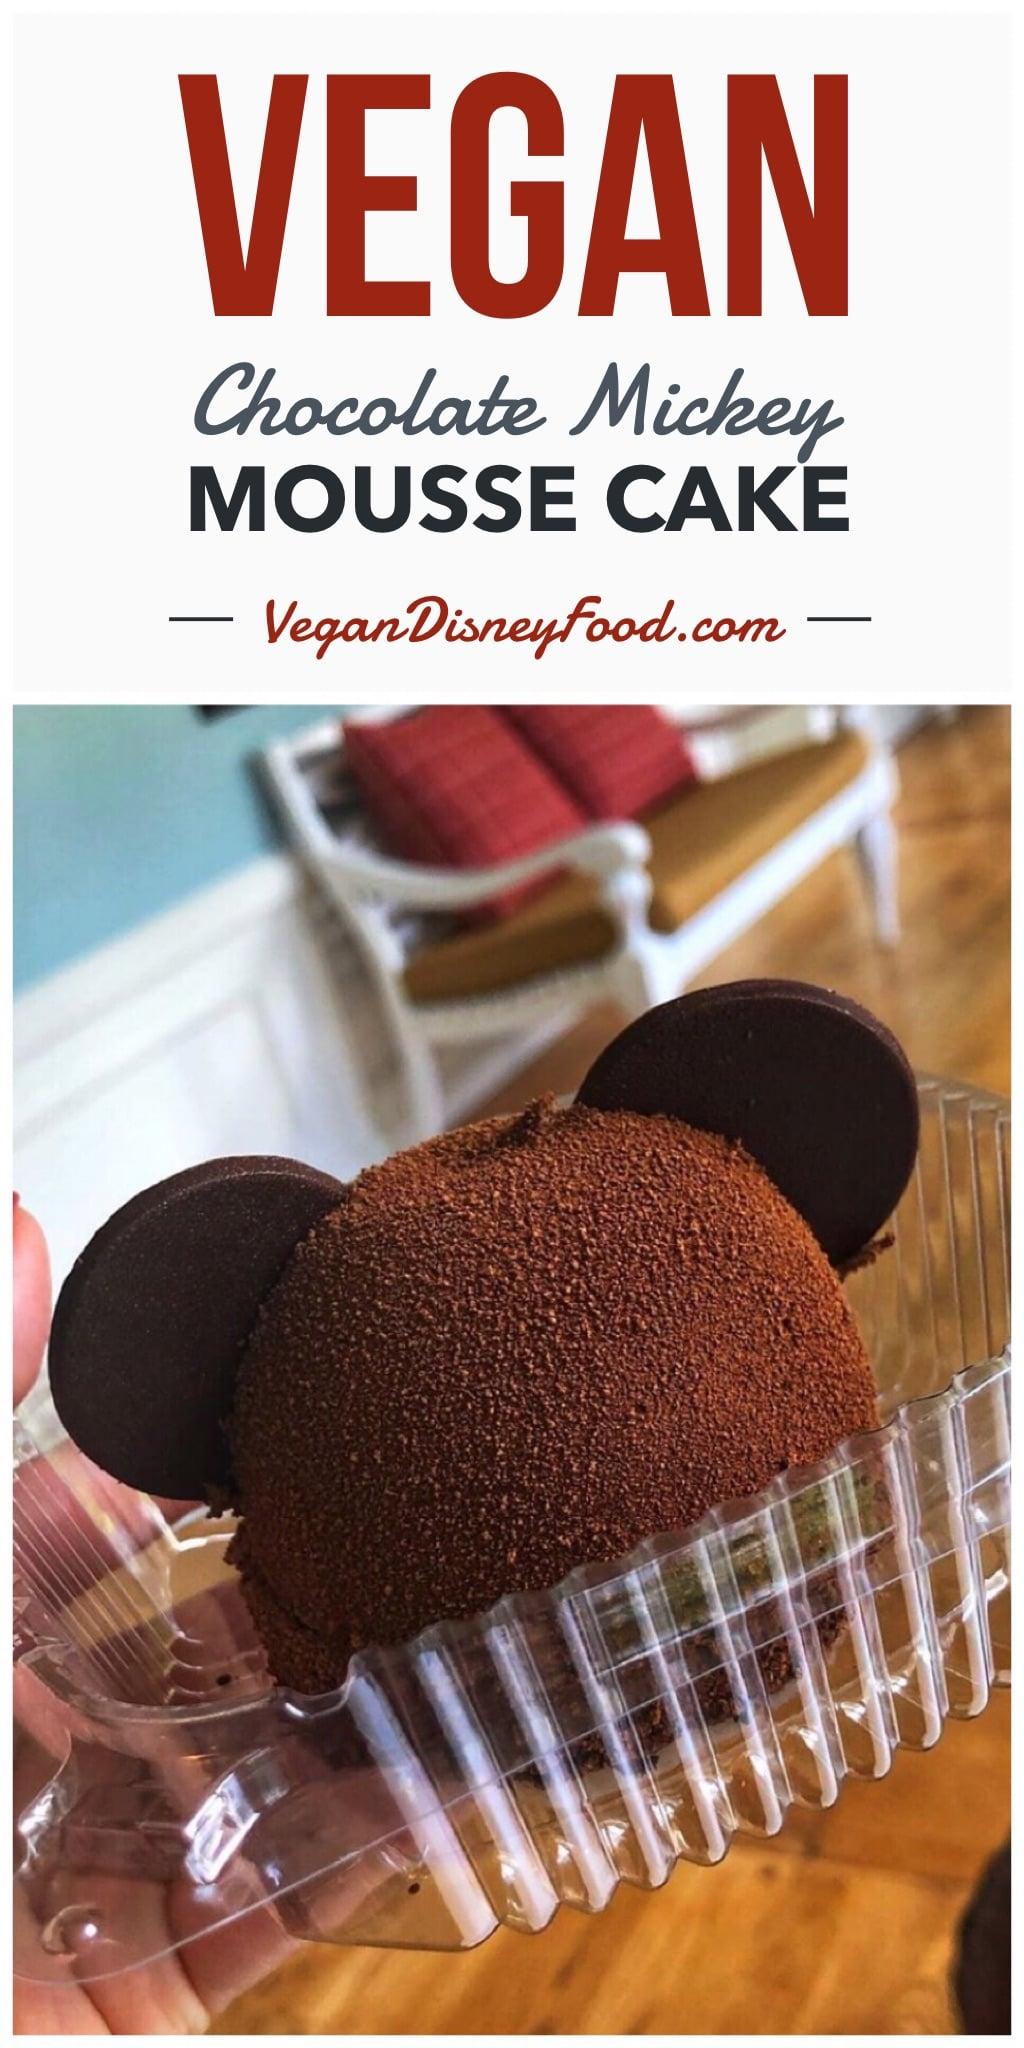 Vegan Chocolate Mickey Mousse Cake at Disney's Beach Club Resort at Walt Disney World